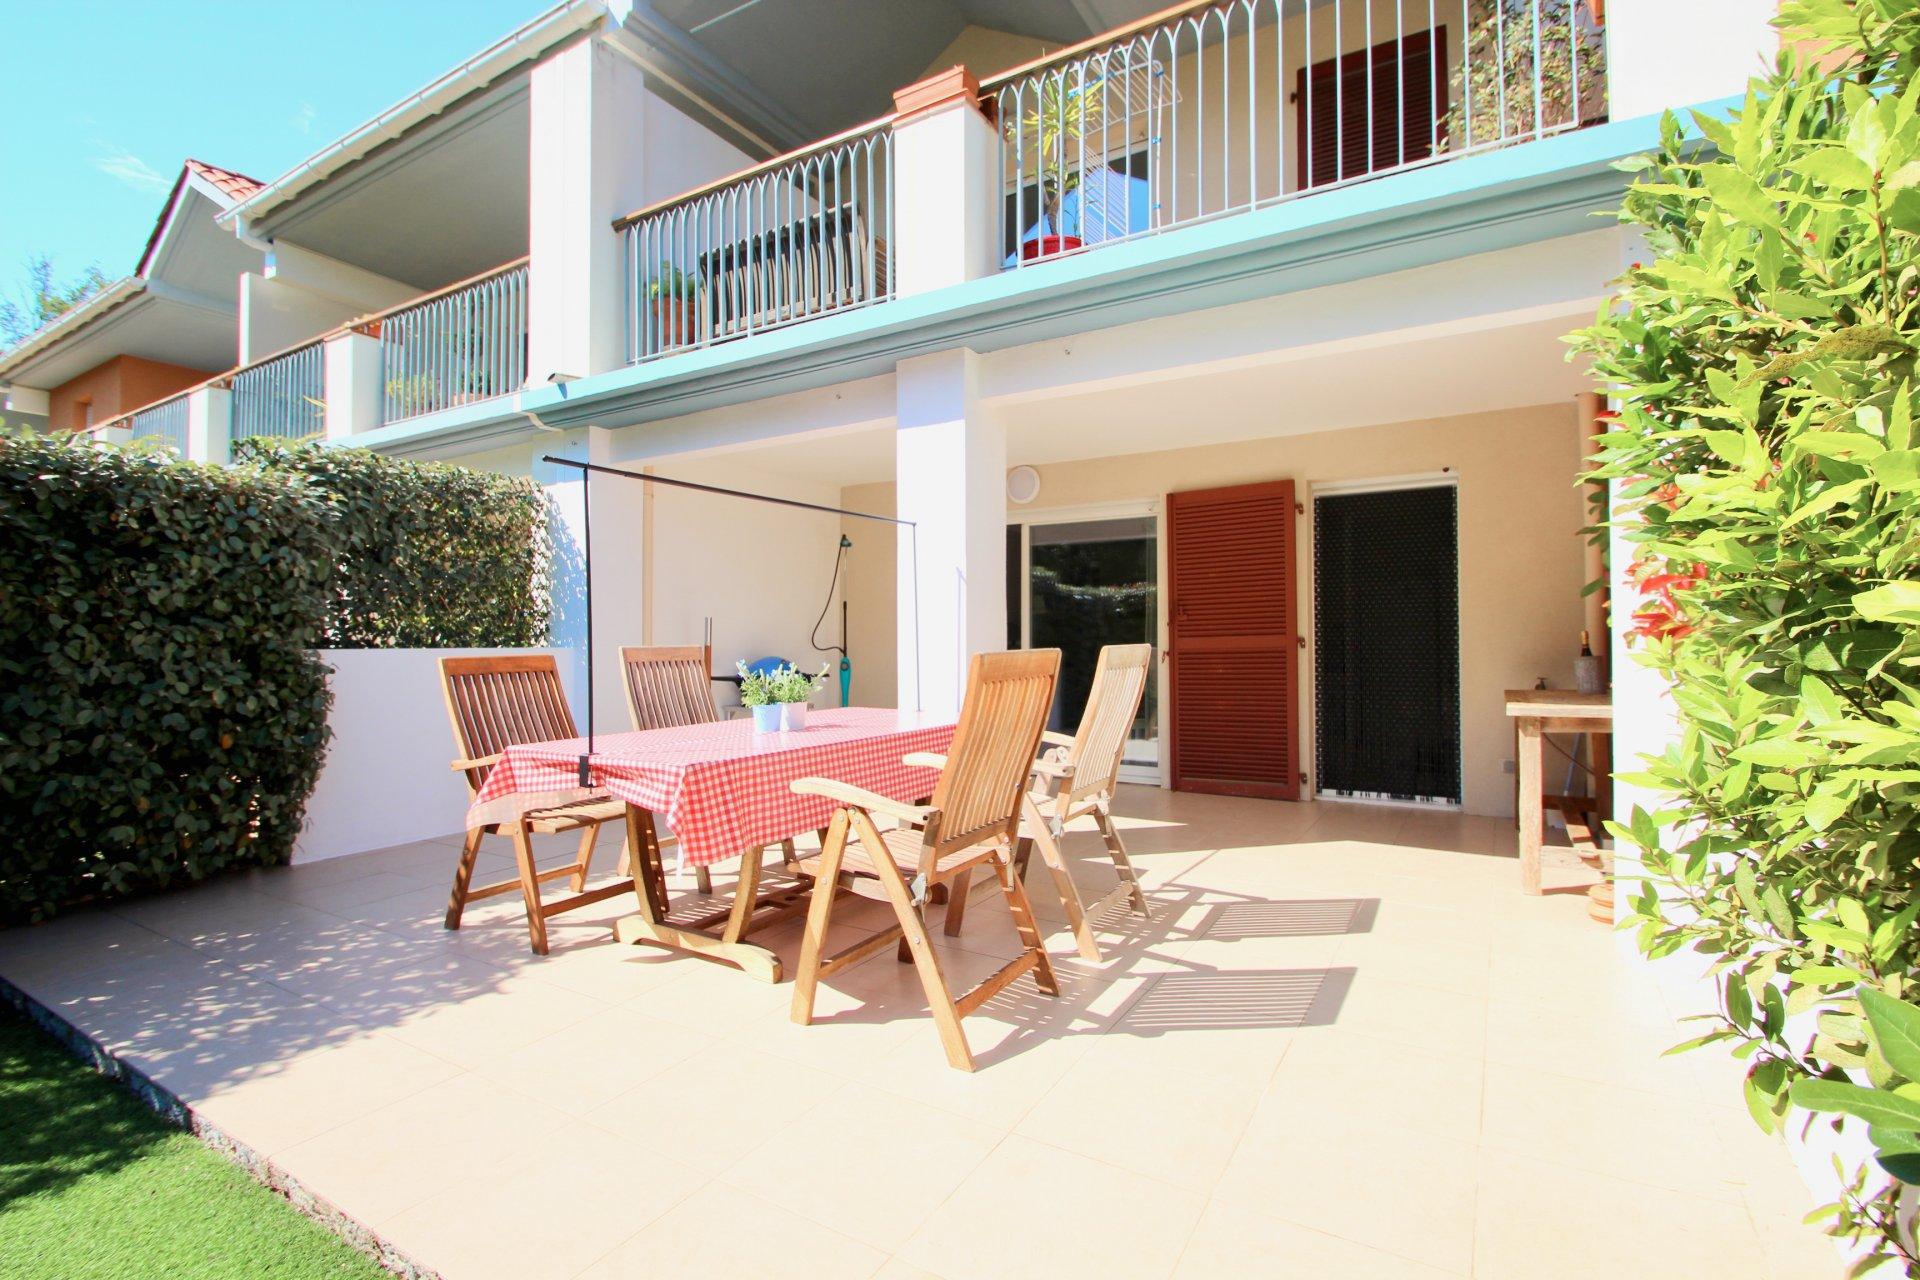 Roquebrune-s/Argens - modern 3k. apartment with garden and 2 garages